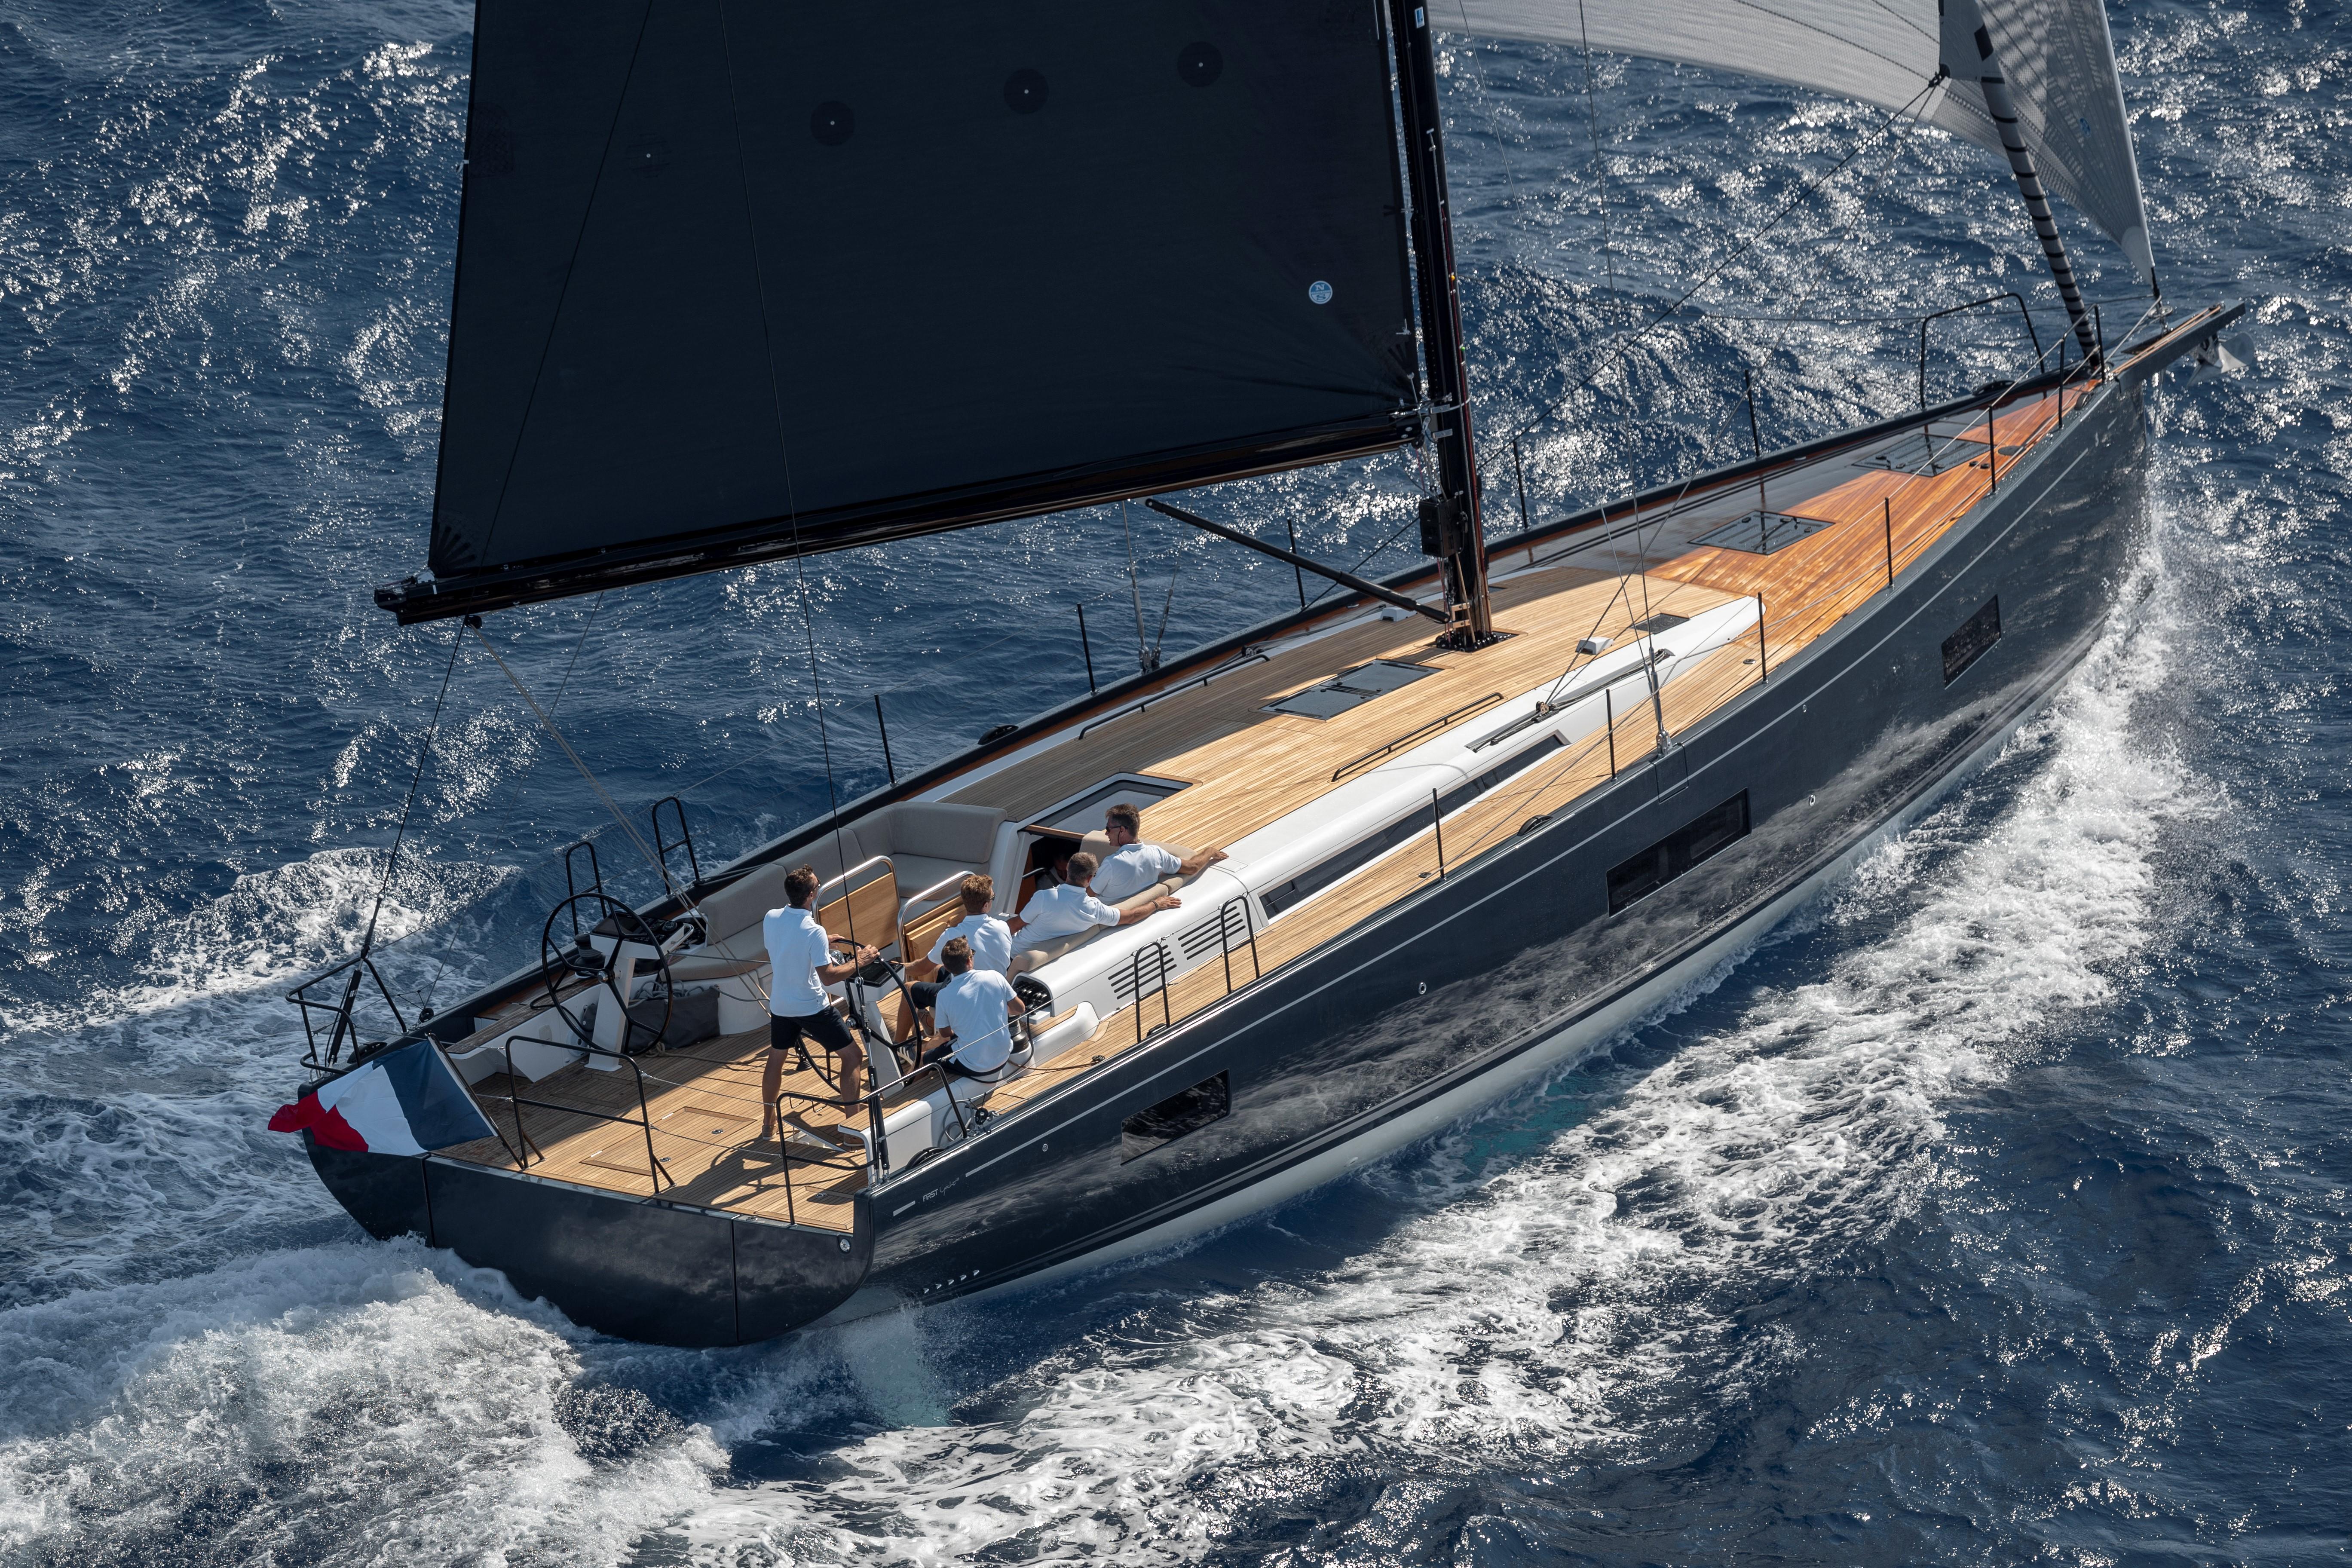 Beneteau First Yacht 53 Beneteau First Yacht 53 - Sailing